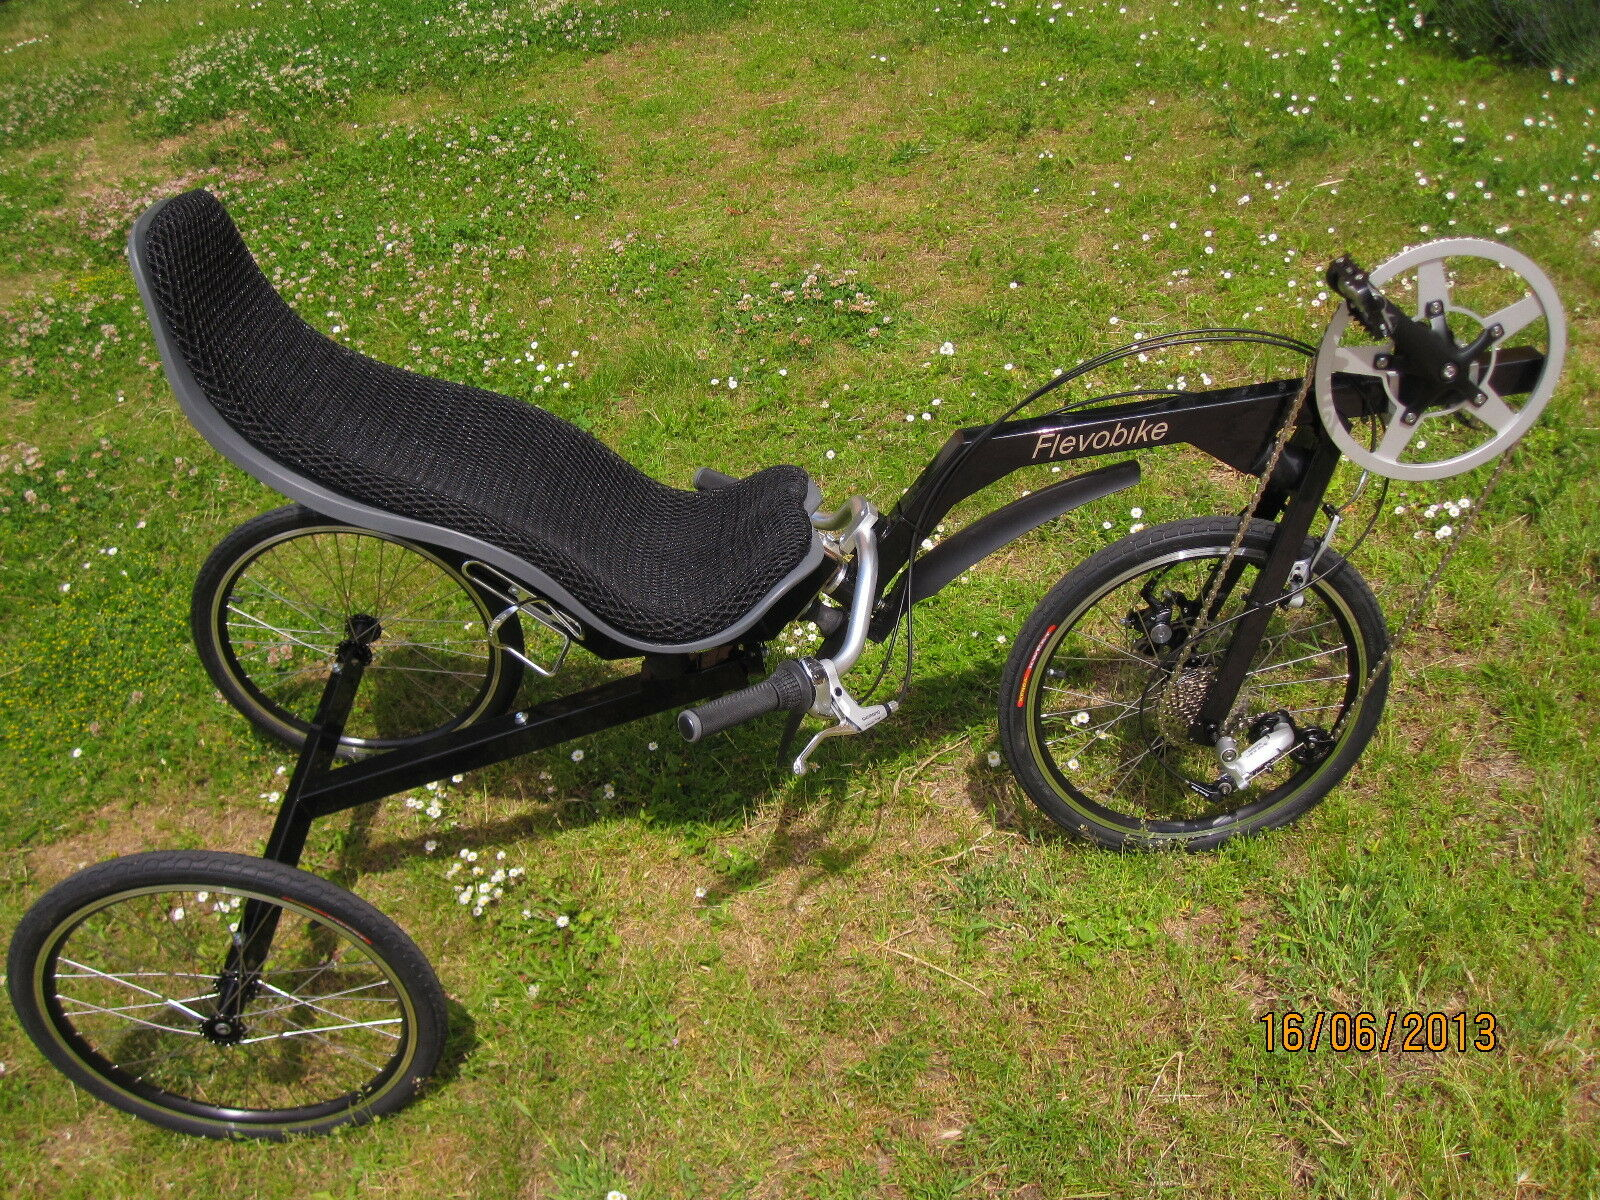 Plegable Plegable Plegable Bicicleta tumbada Triciclo flevobike flevo trike  Envío 100% gratuito